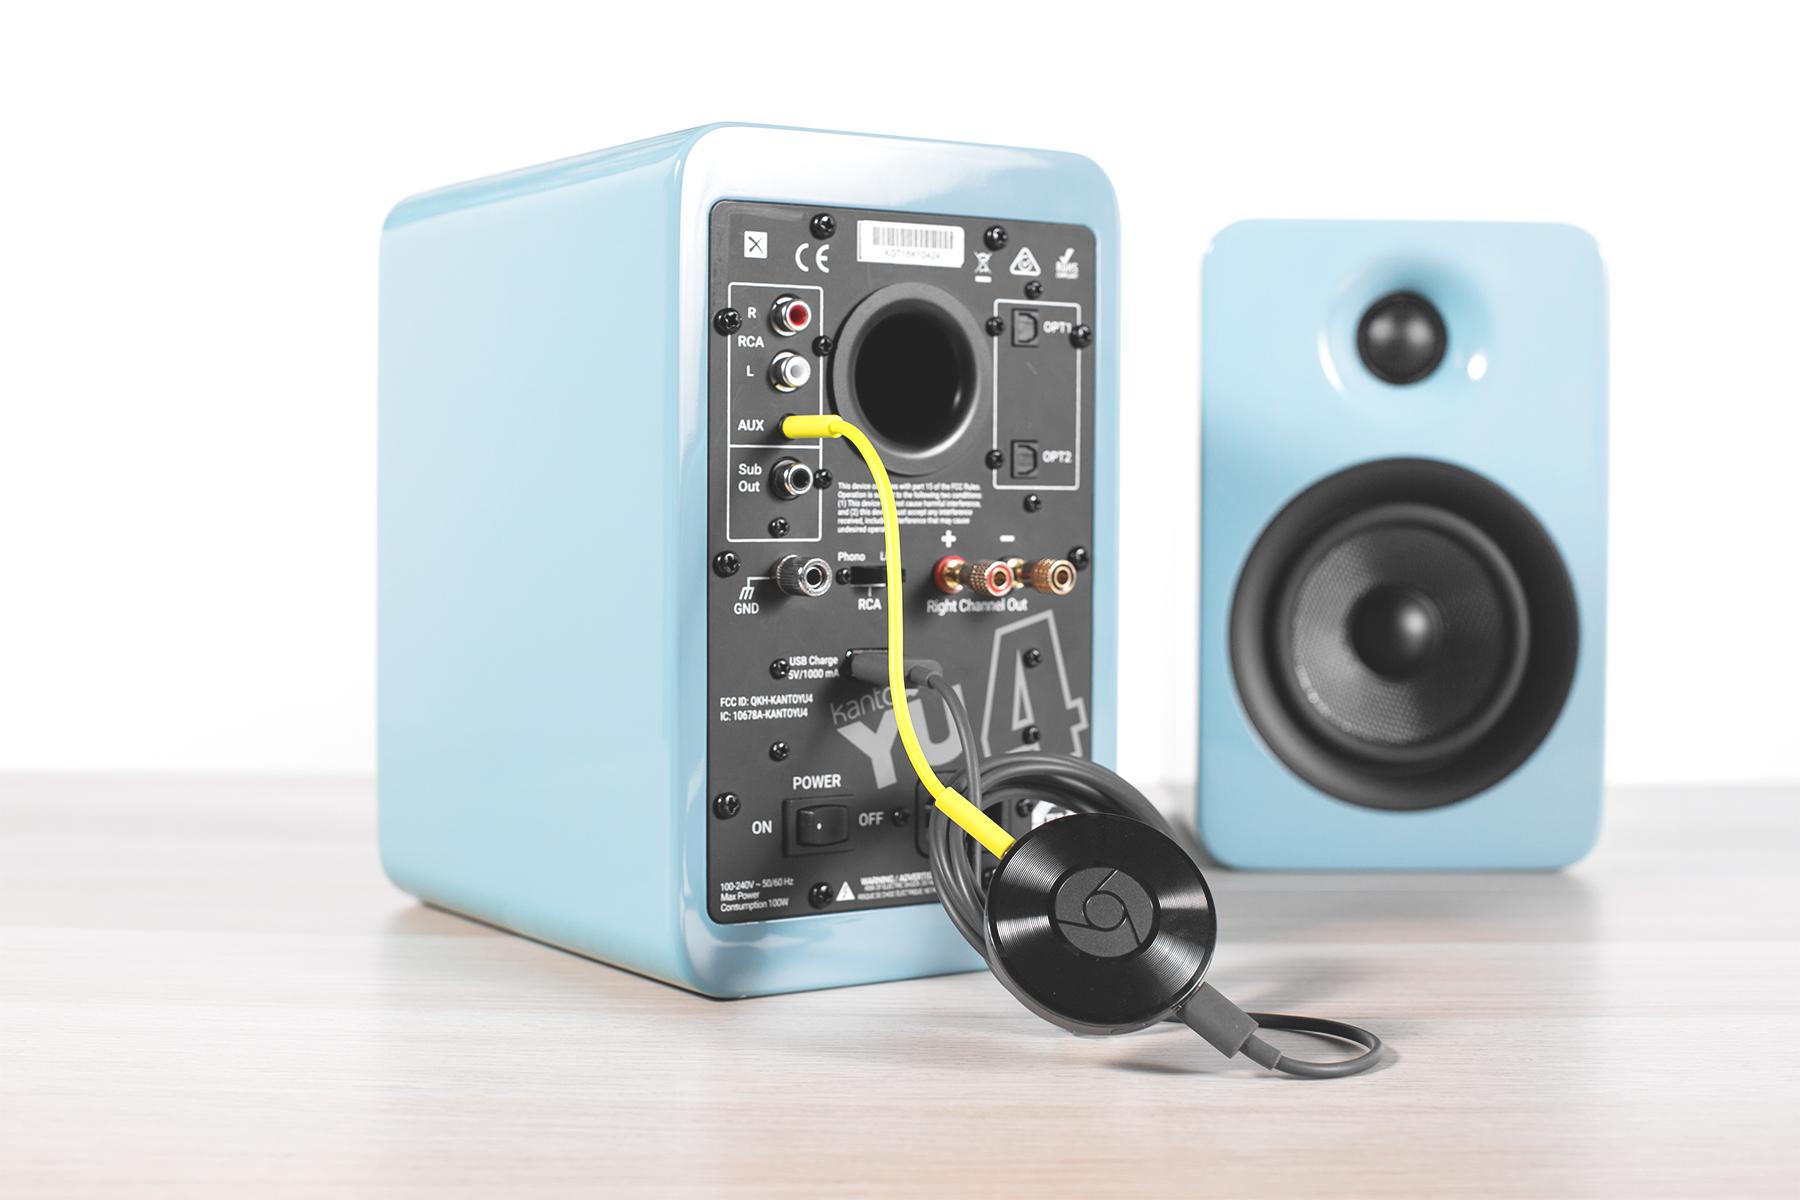 How to create a multi-room audio setup with Chromecast Audio